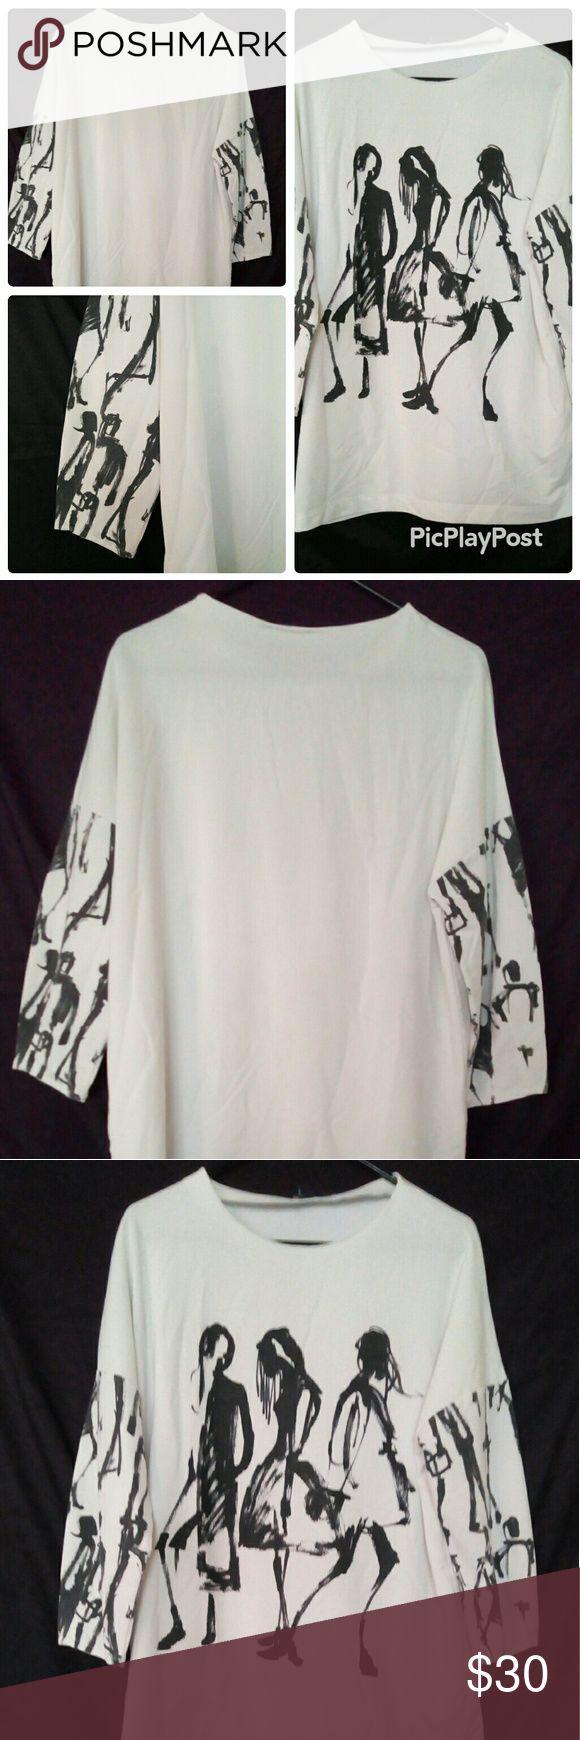 Selling this Zara Women graphics falchion white Tshit size M on Poshmark! My username is: poshlucci69. #shopmycloset #poshmark #fashion #shopping #style #forsale #Zara #Other